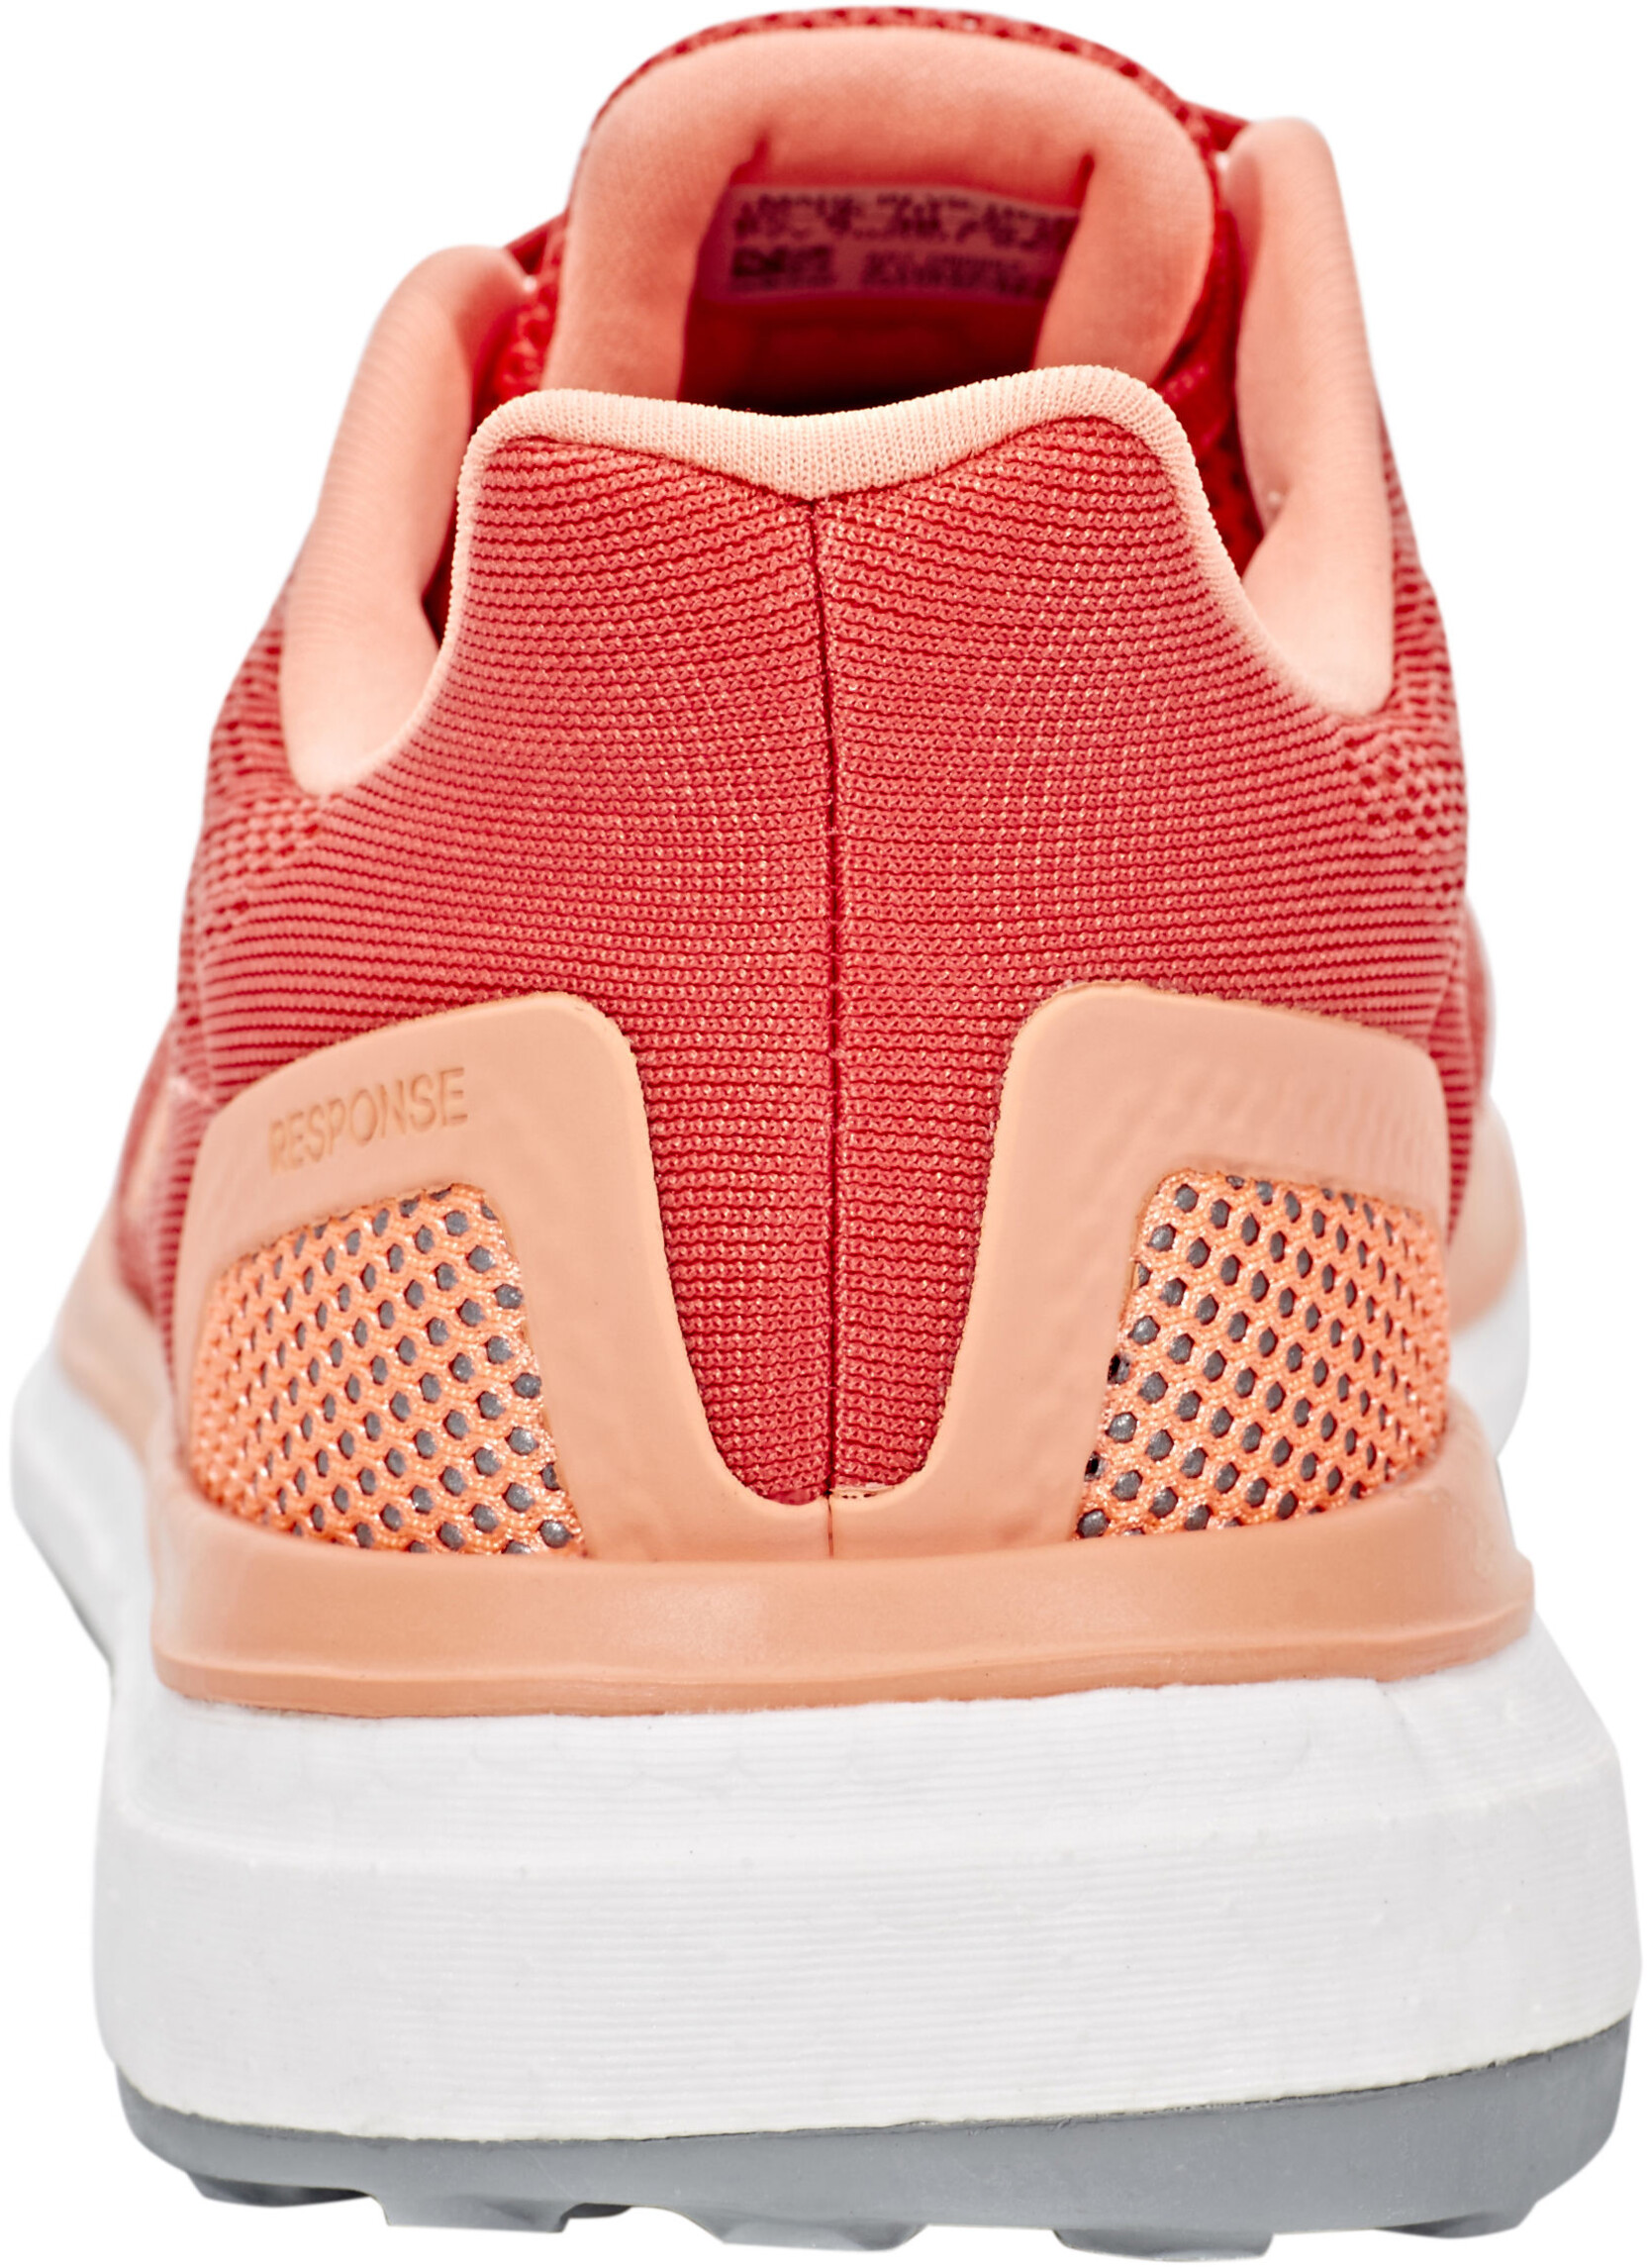 1376c55801089c adidas Response Shoes Women trasca chalk coral grey tree